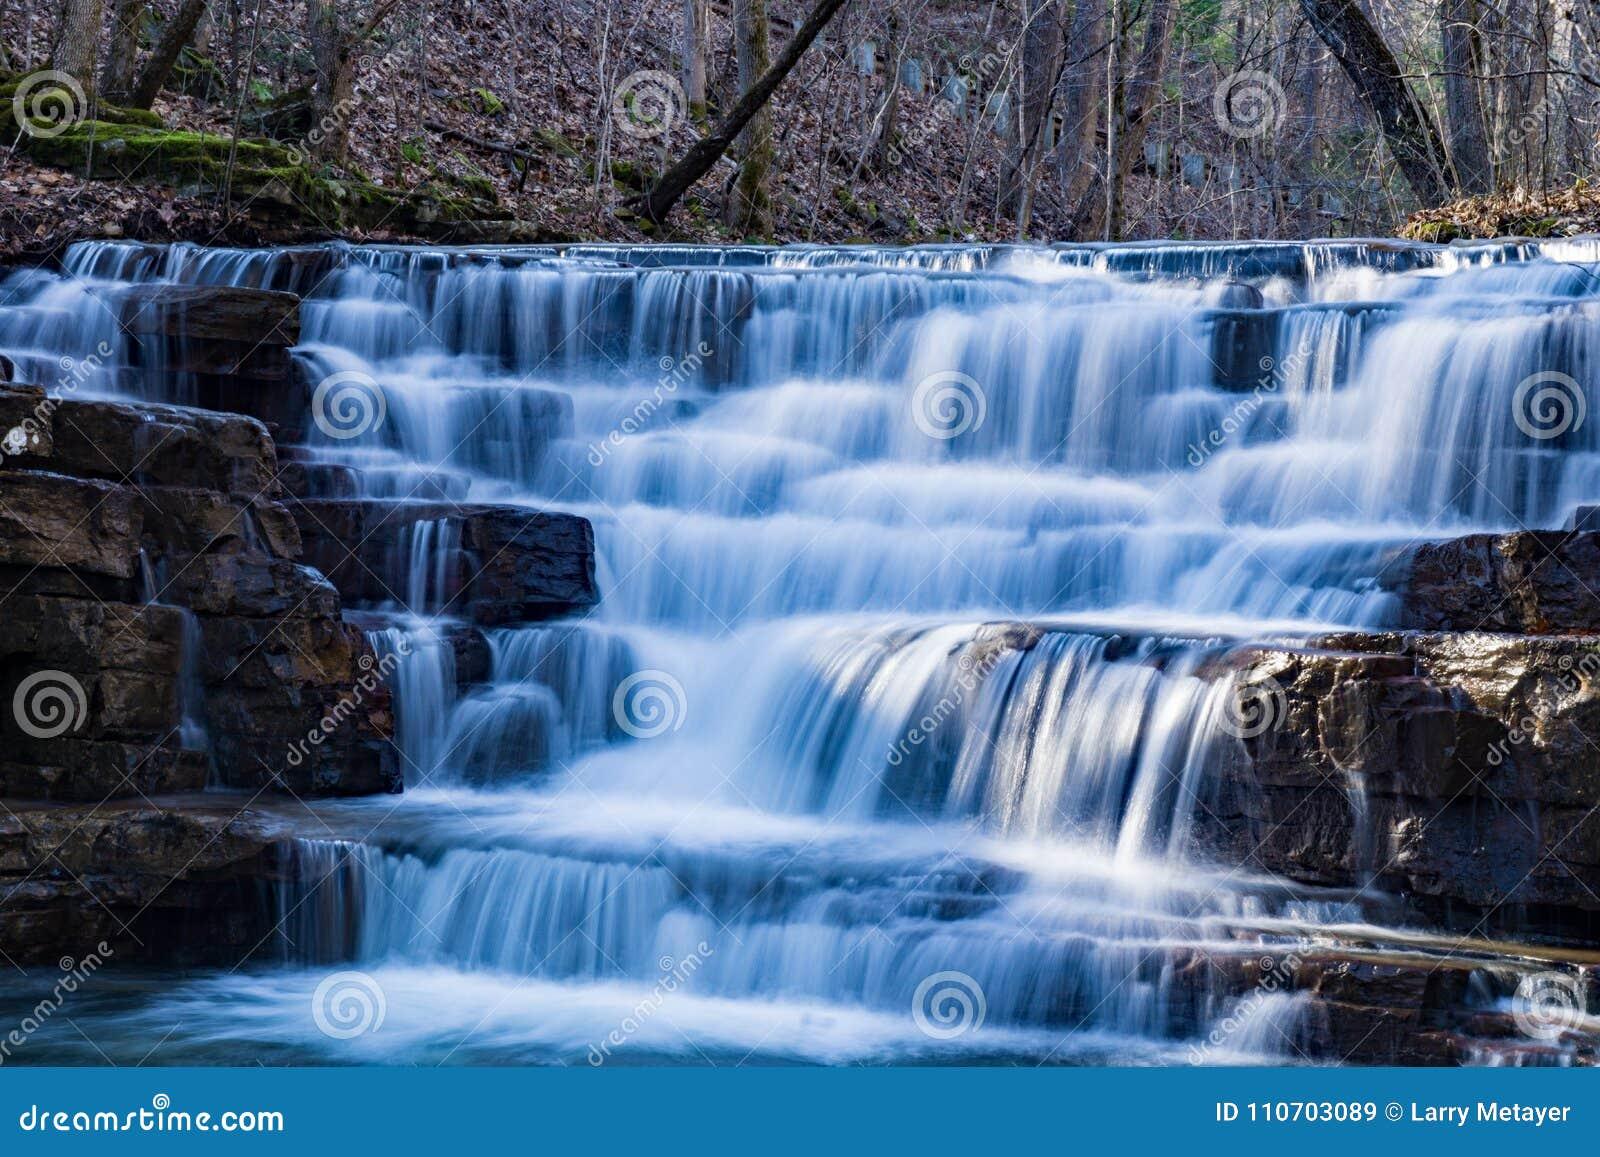 Fenwick mina a cachoeira - 2